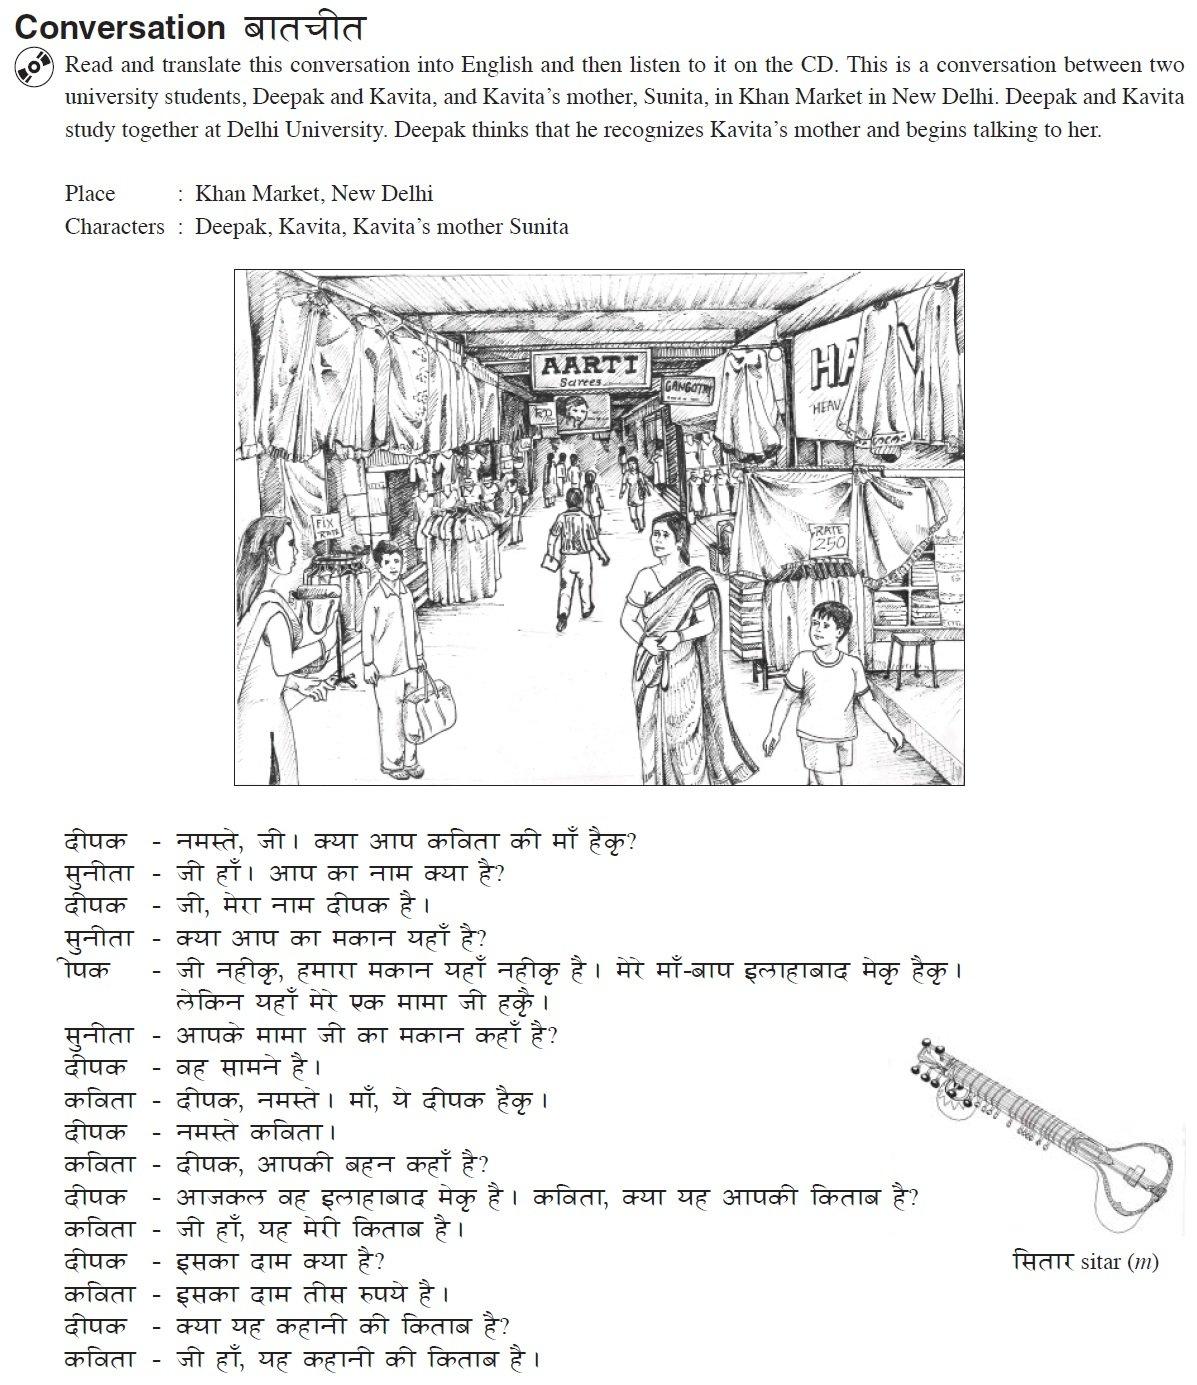 Elementary Hindi Workbook: Richard Delacy, Sudha Joshi